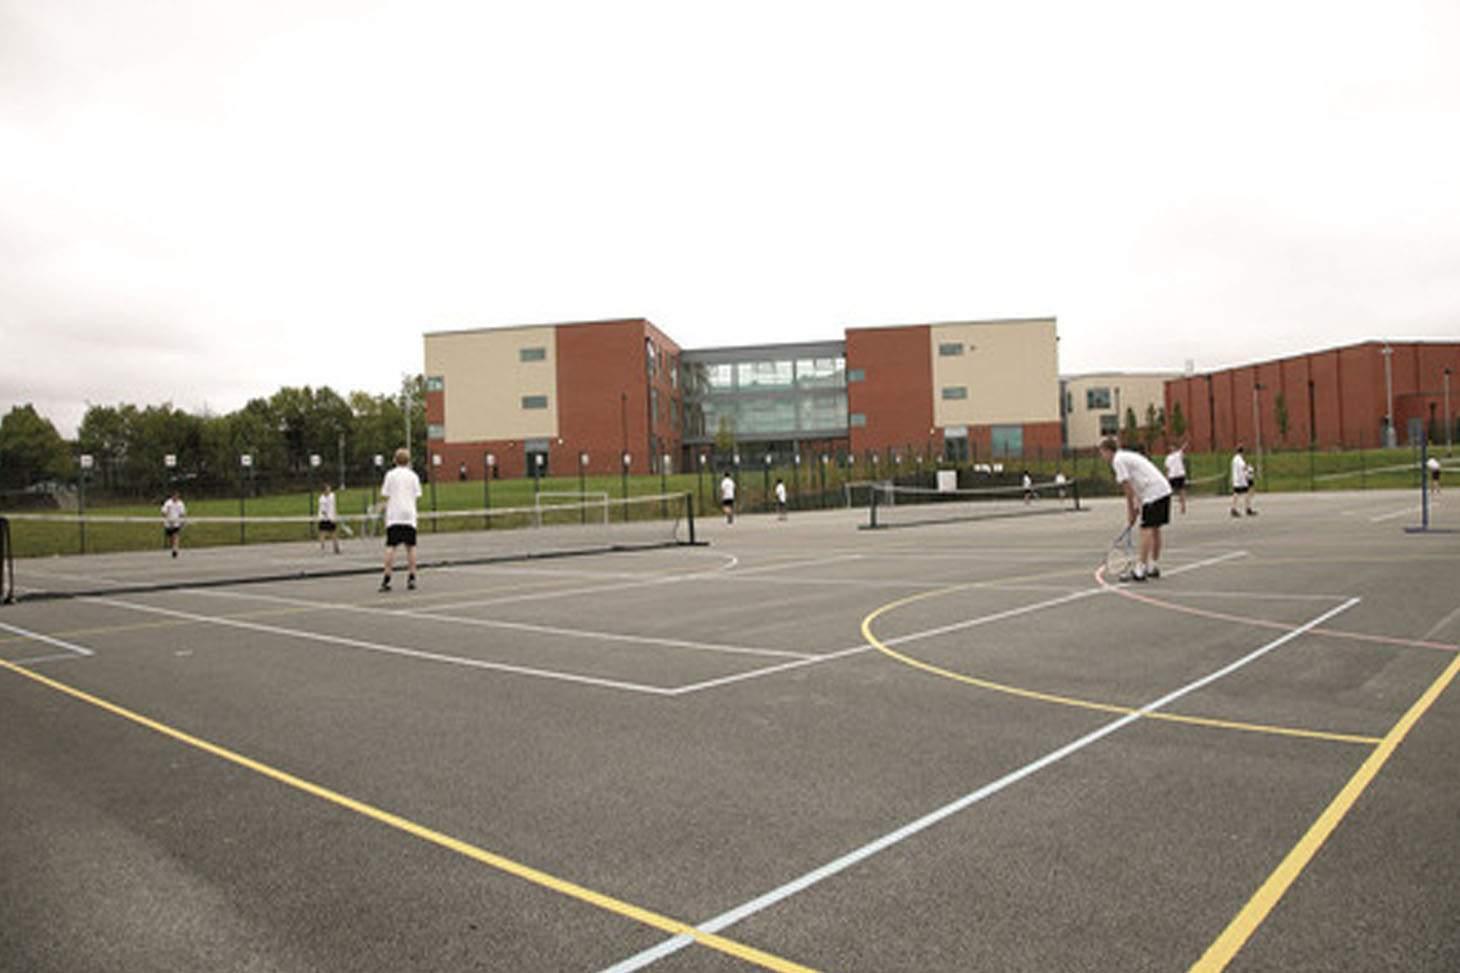 Sheffield Park Academy Outdoor | Hard (macadam) tennis court